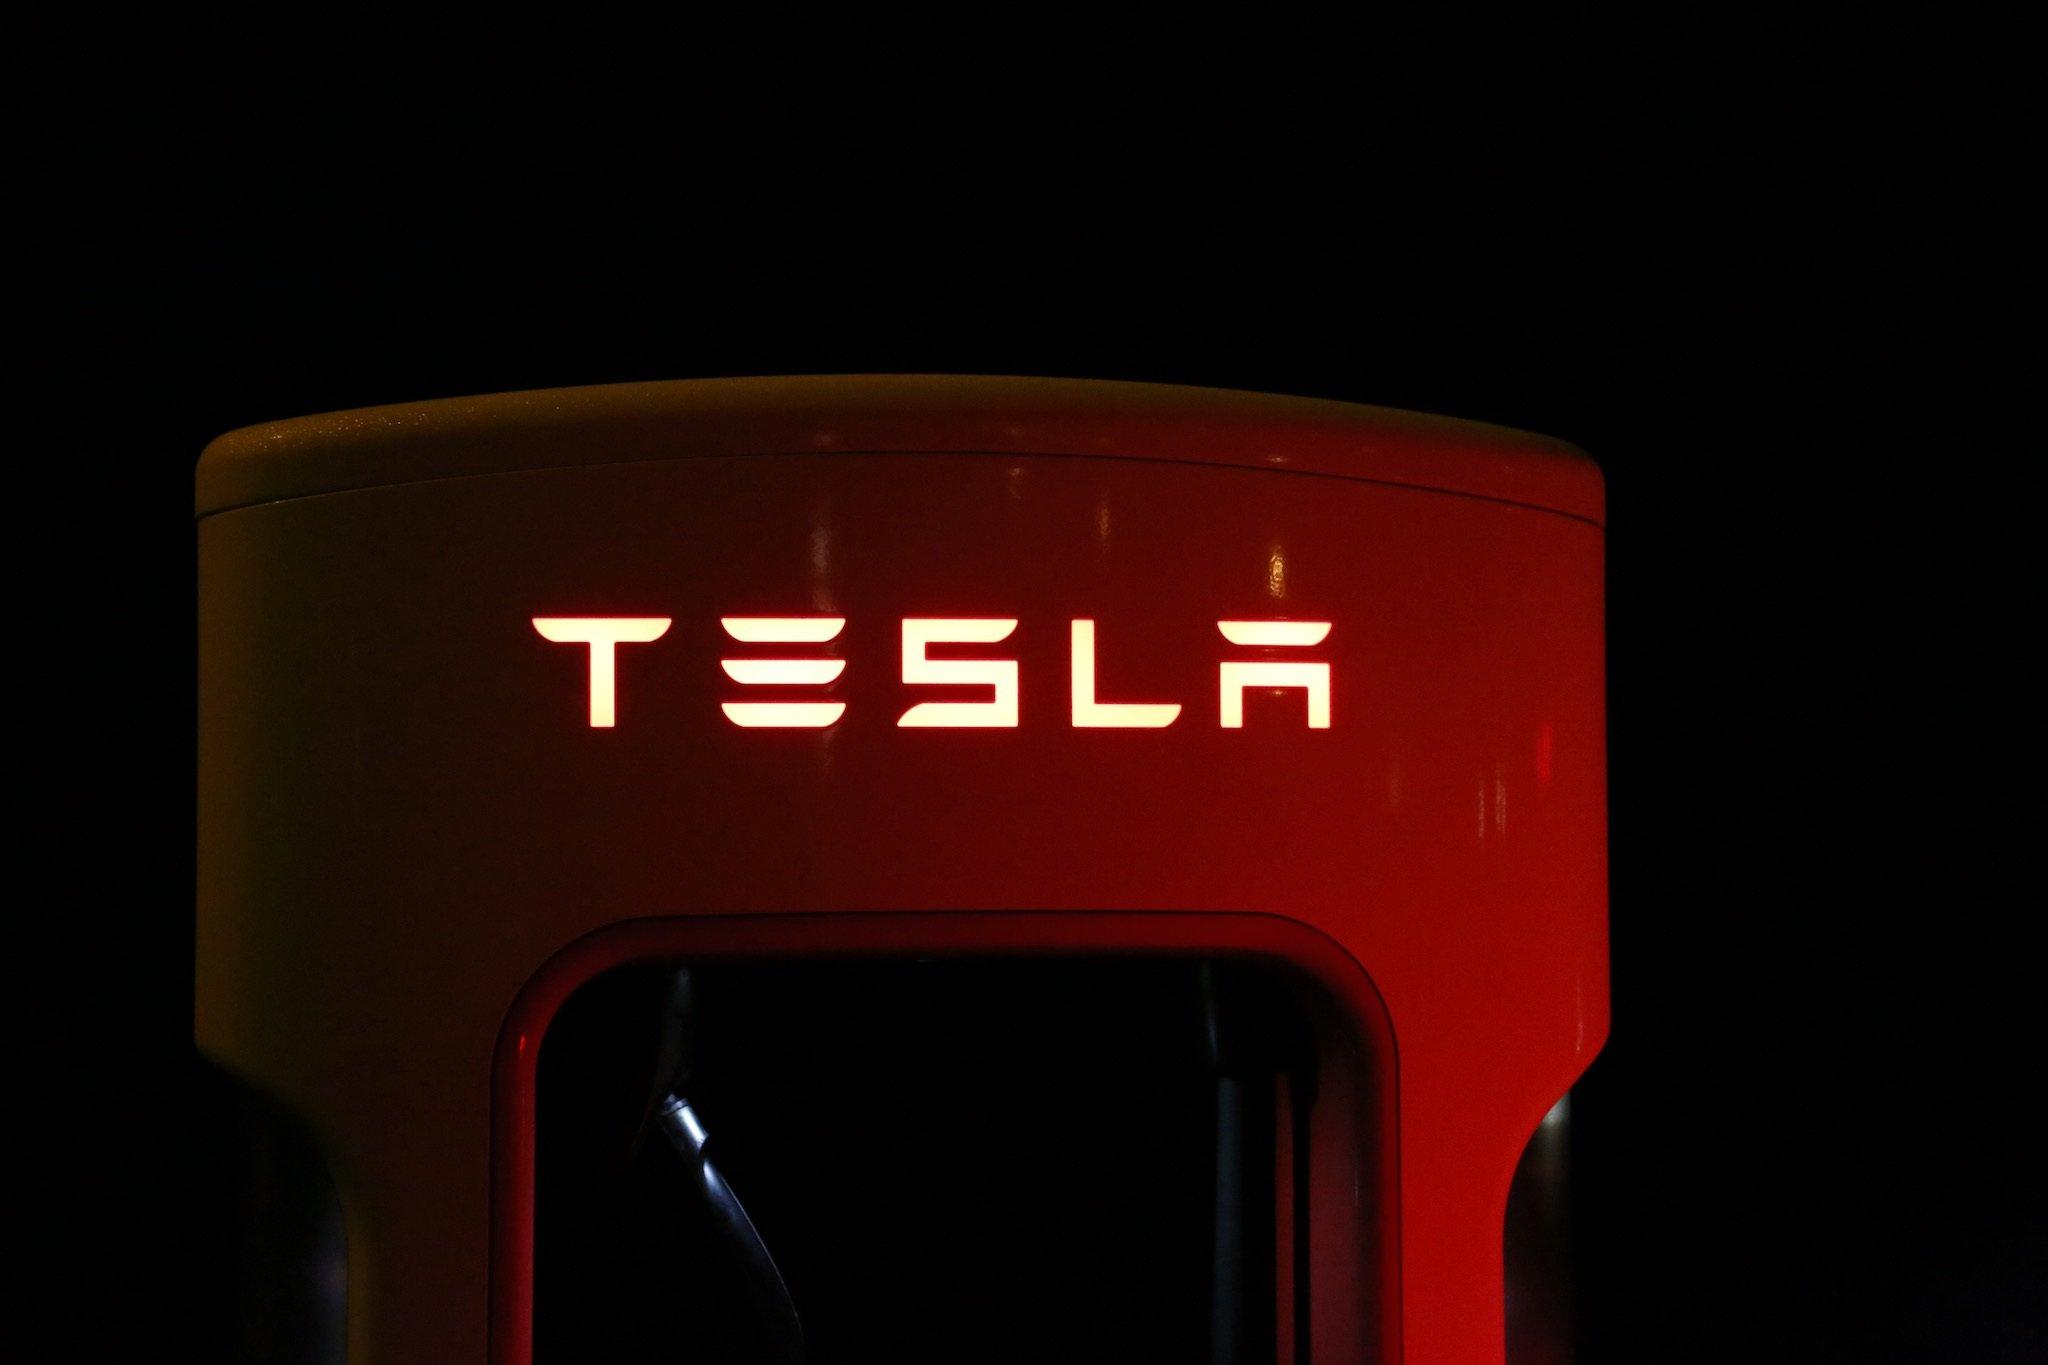 258083_pexels_Tesla_Image_Pixabay